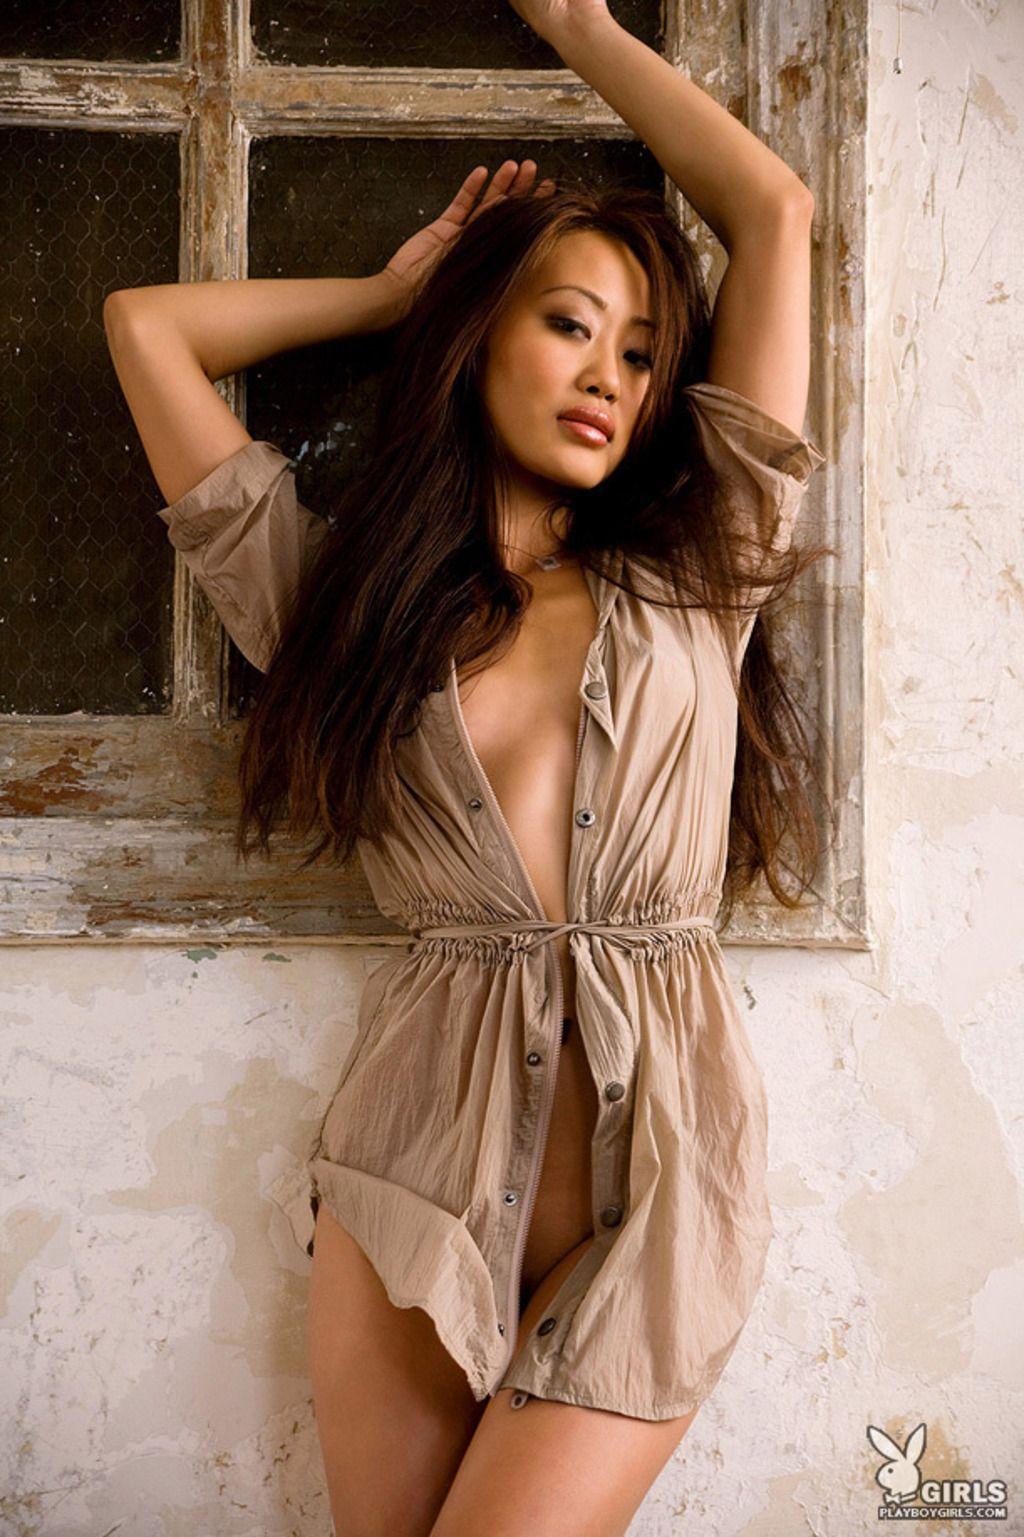 Latin American Female